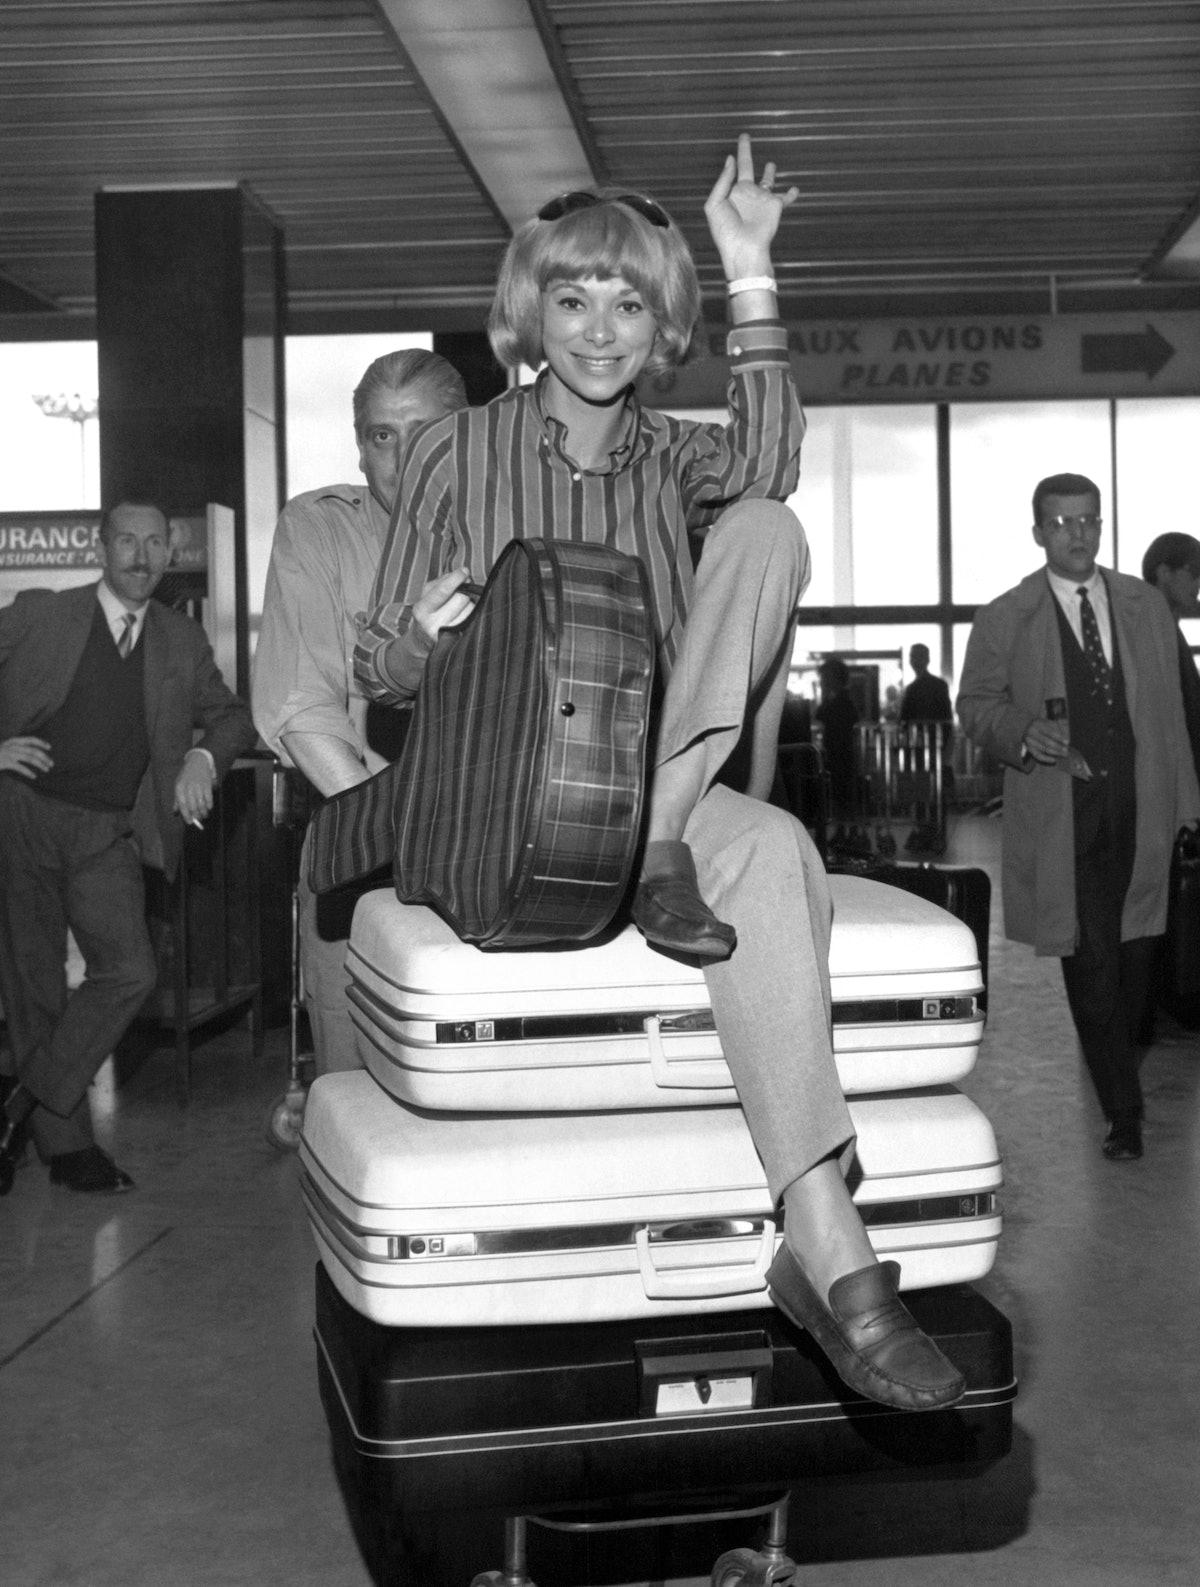 Mireille Darc A L'Aeroport D'Orly